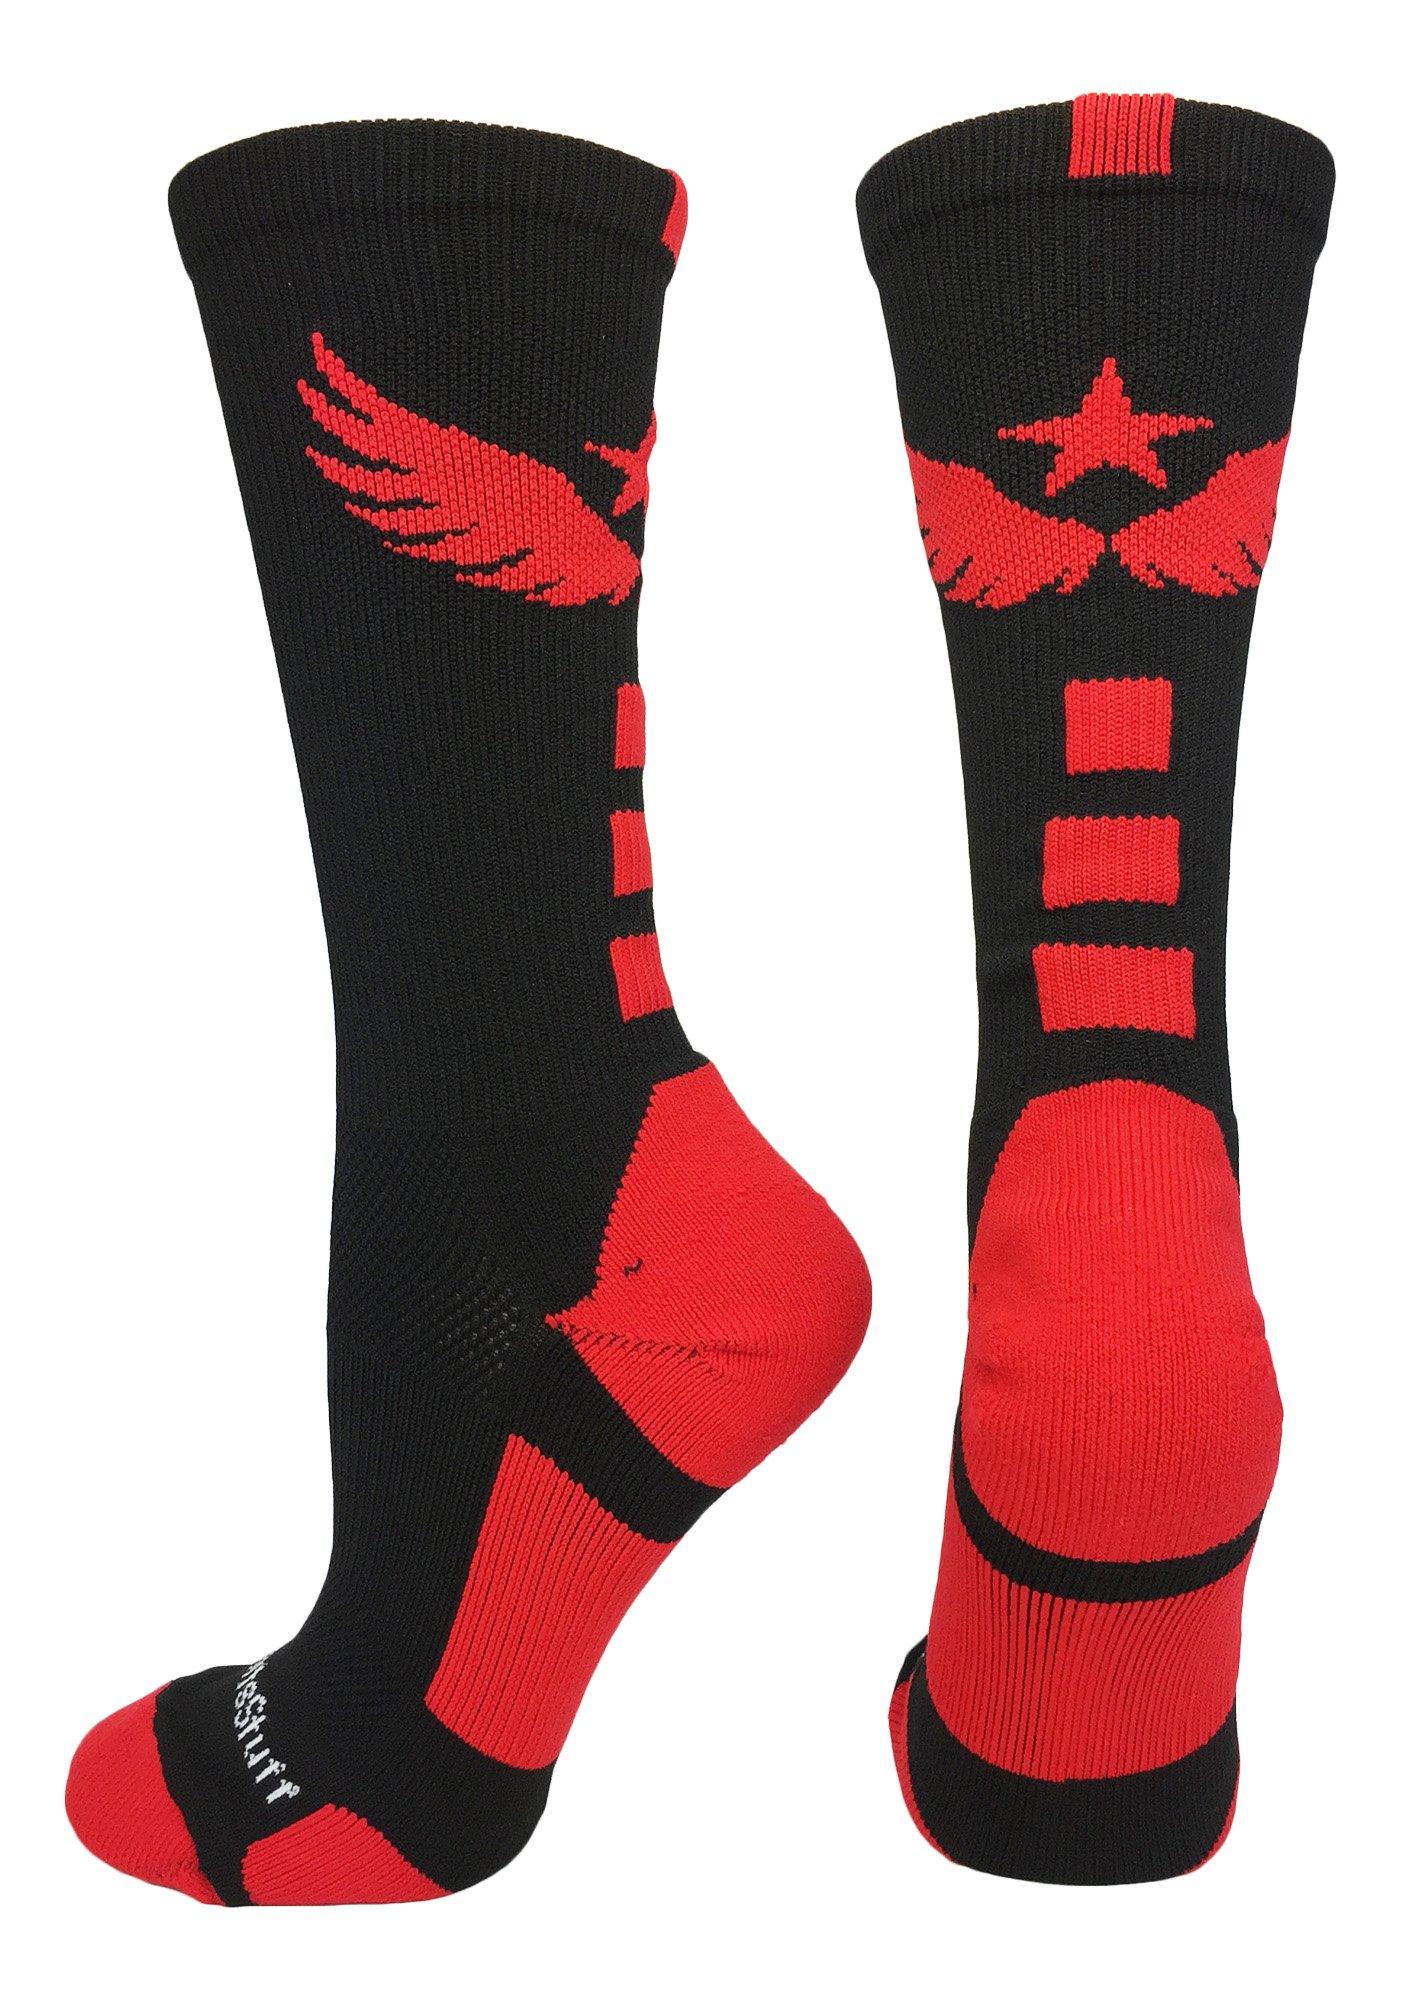 MadSportsStuff Light Speed Athletic Crew Socks (Black/Red, Large) by MadSportsStuff